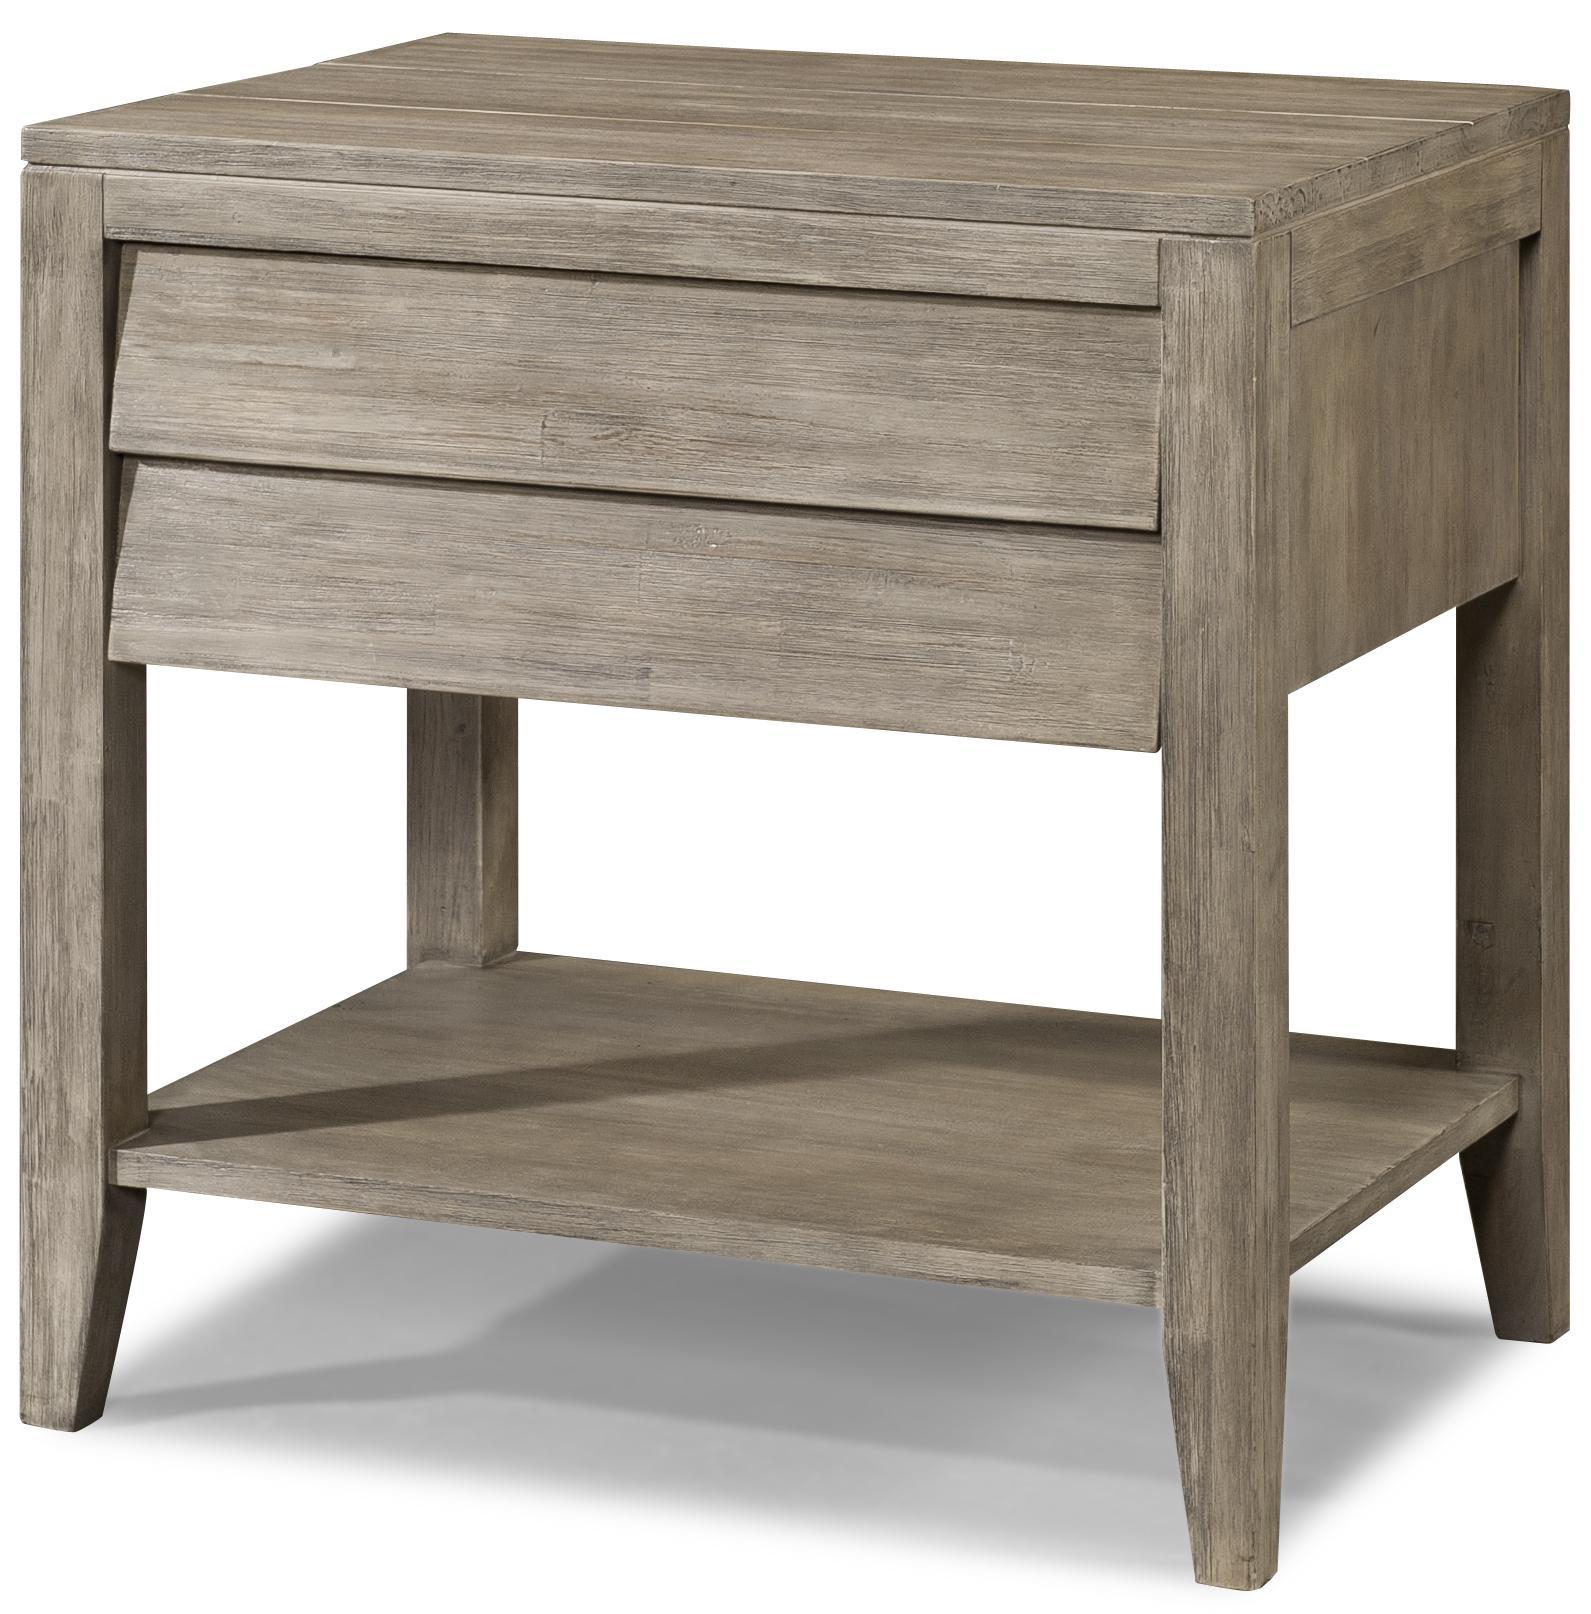 Cresent Fine Furniture Corliss Landing Powered Nightstand - Item Number: 5612